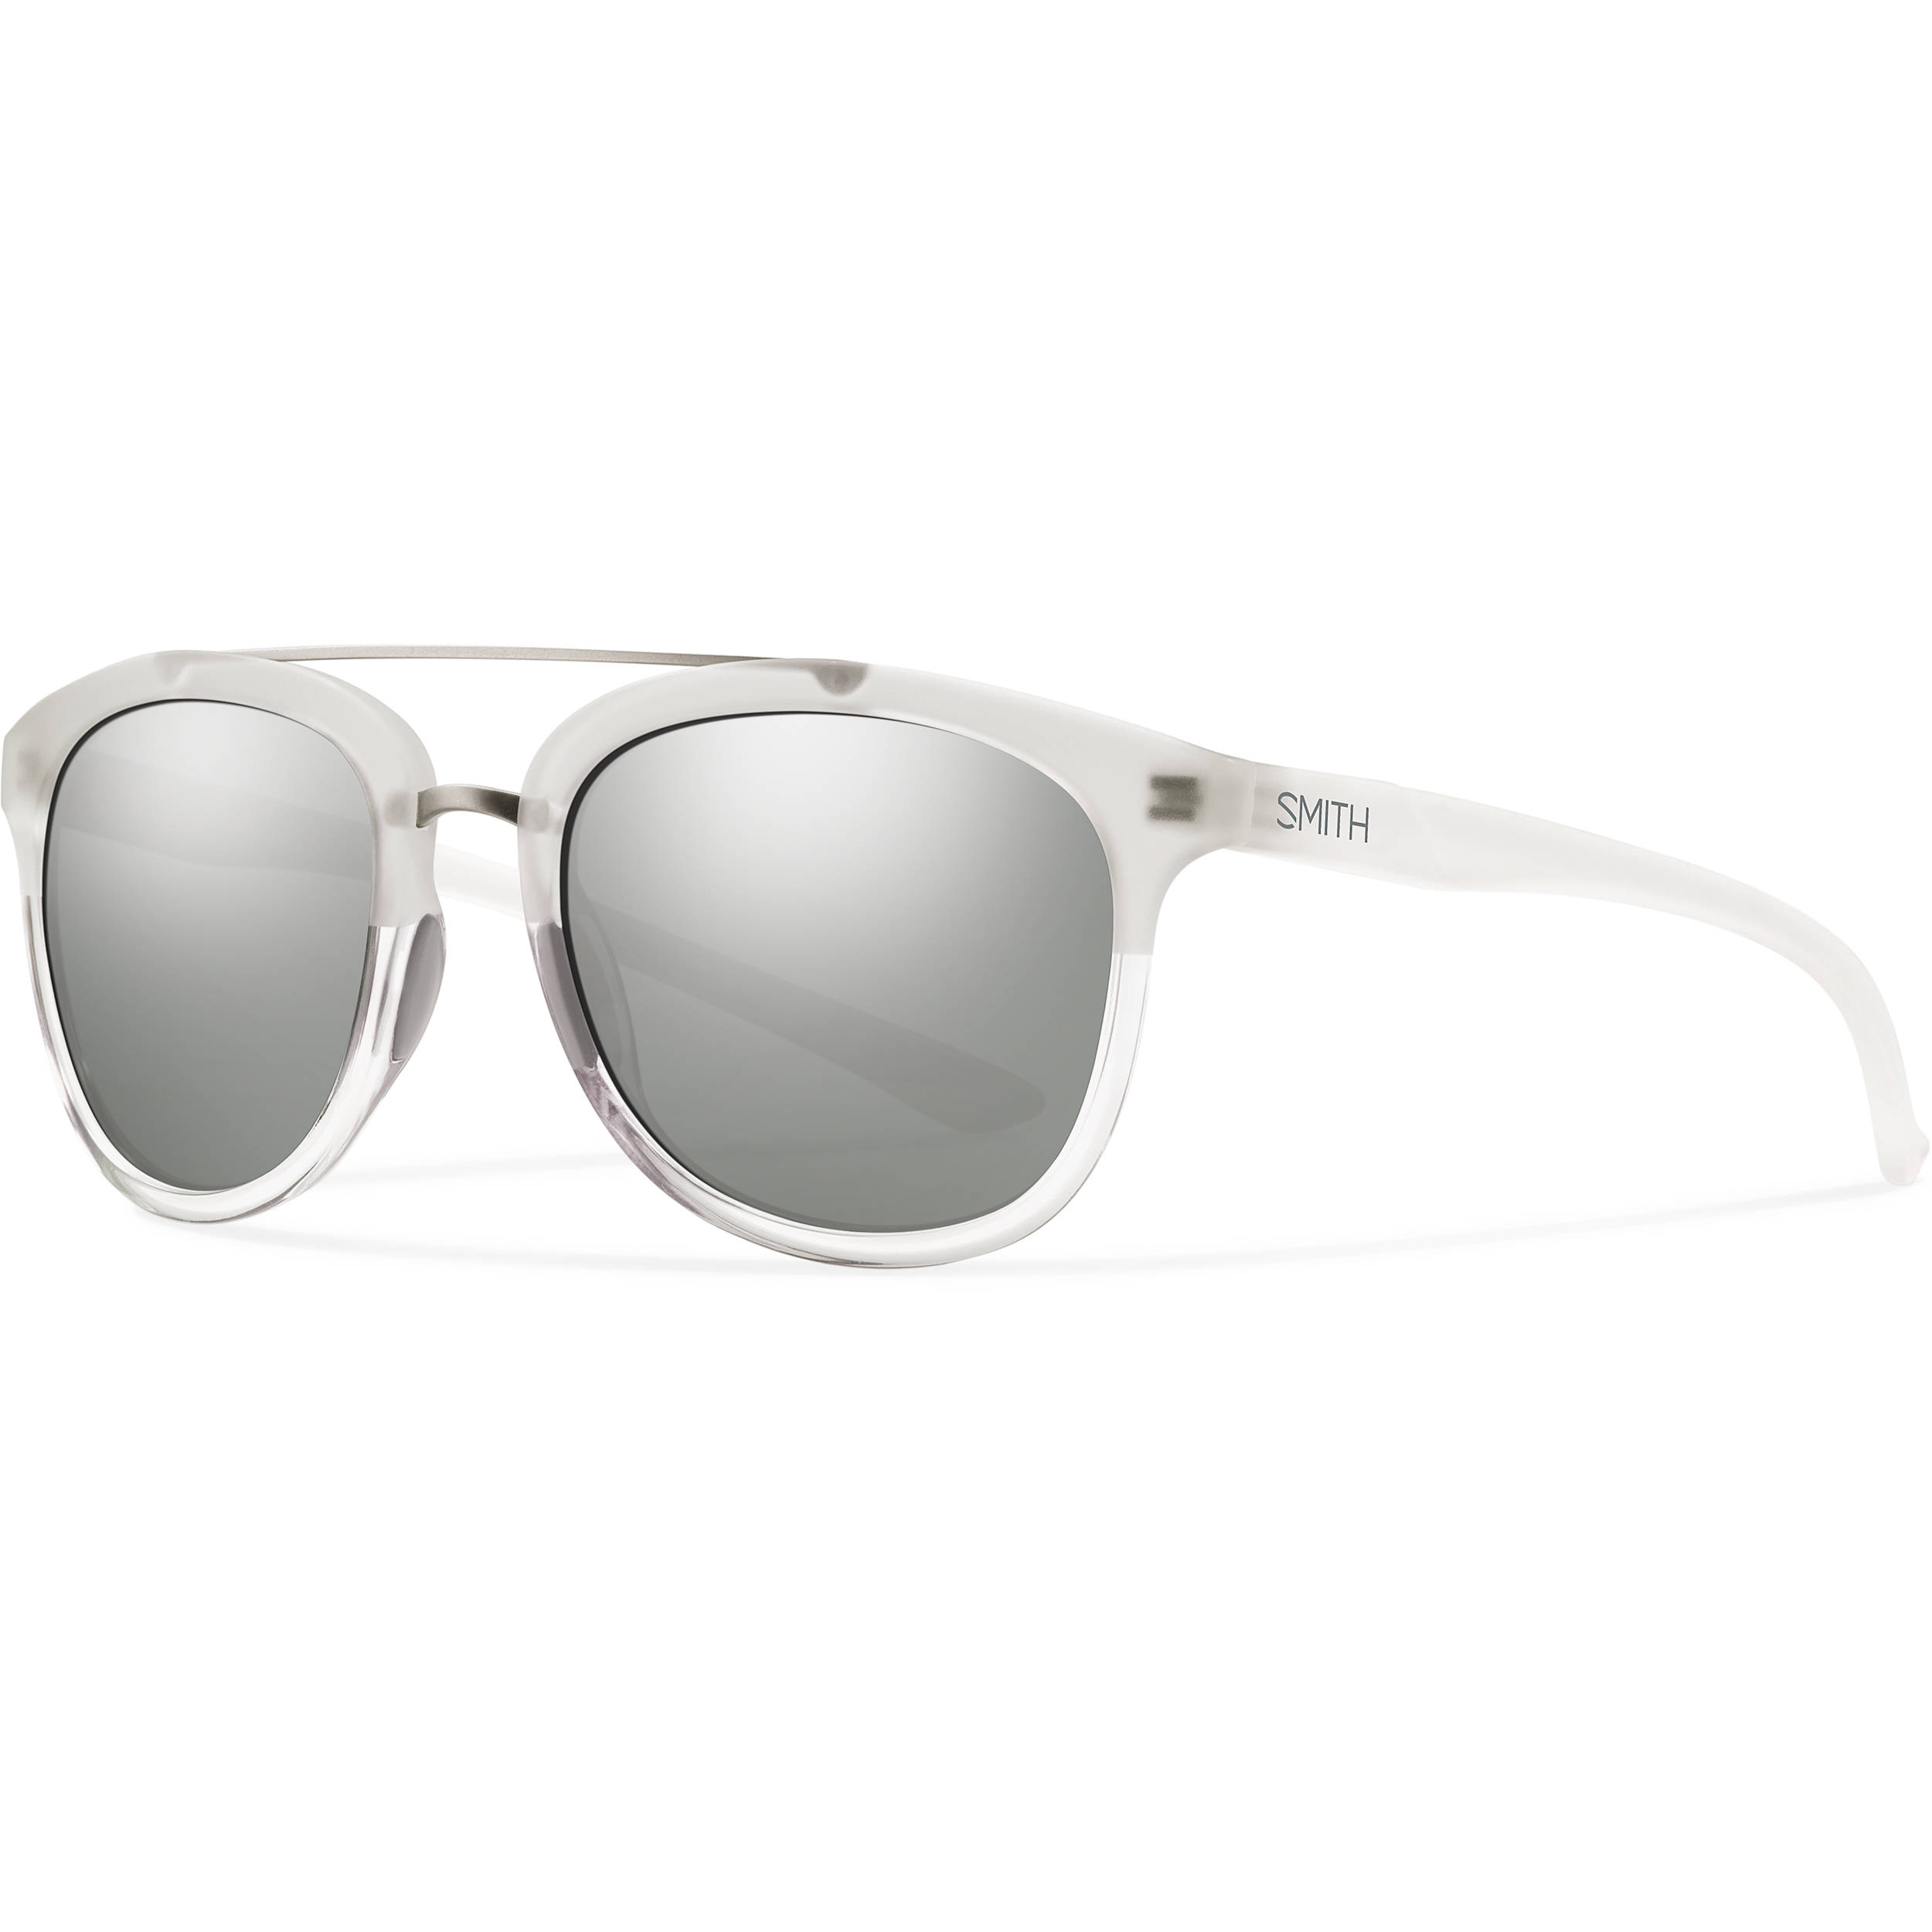 ae9027292ab51 Smith Optics Clayton Sunglasses with Super Platinum Mirror Coating (Crystal  Split Frame)